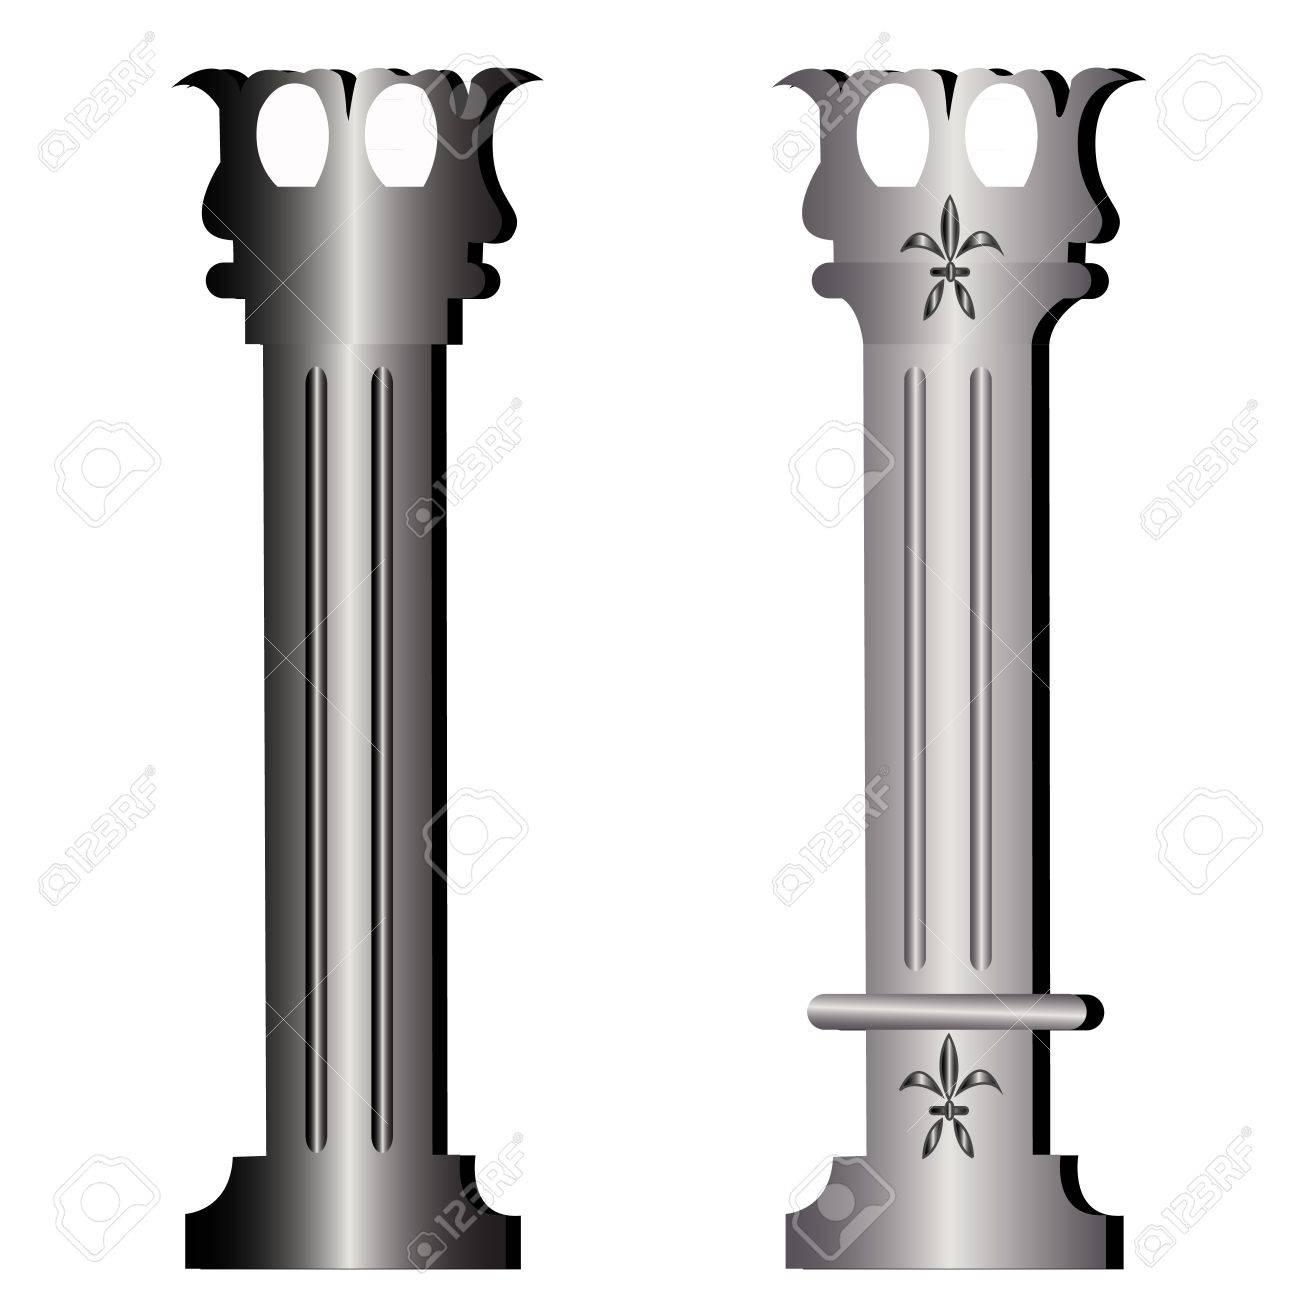 Columns ancient greek historic building Stock Vector - 12379721